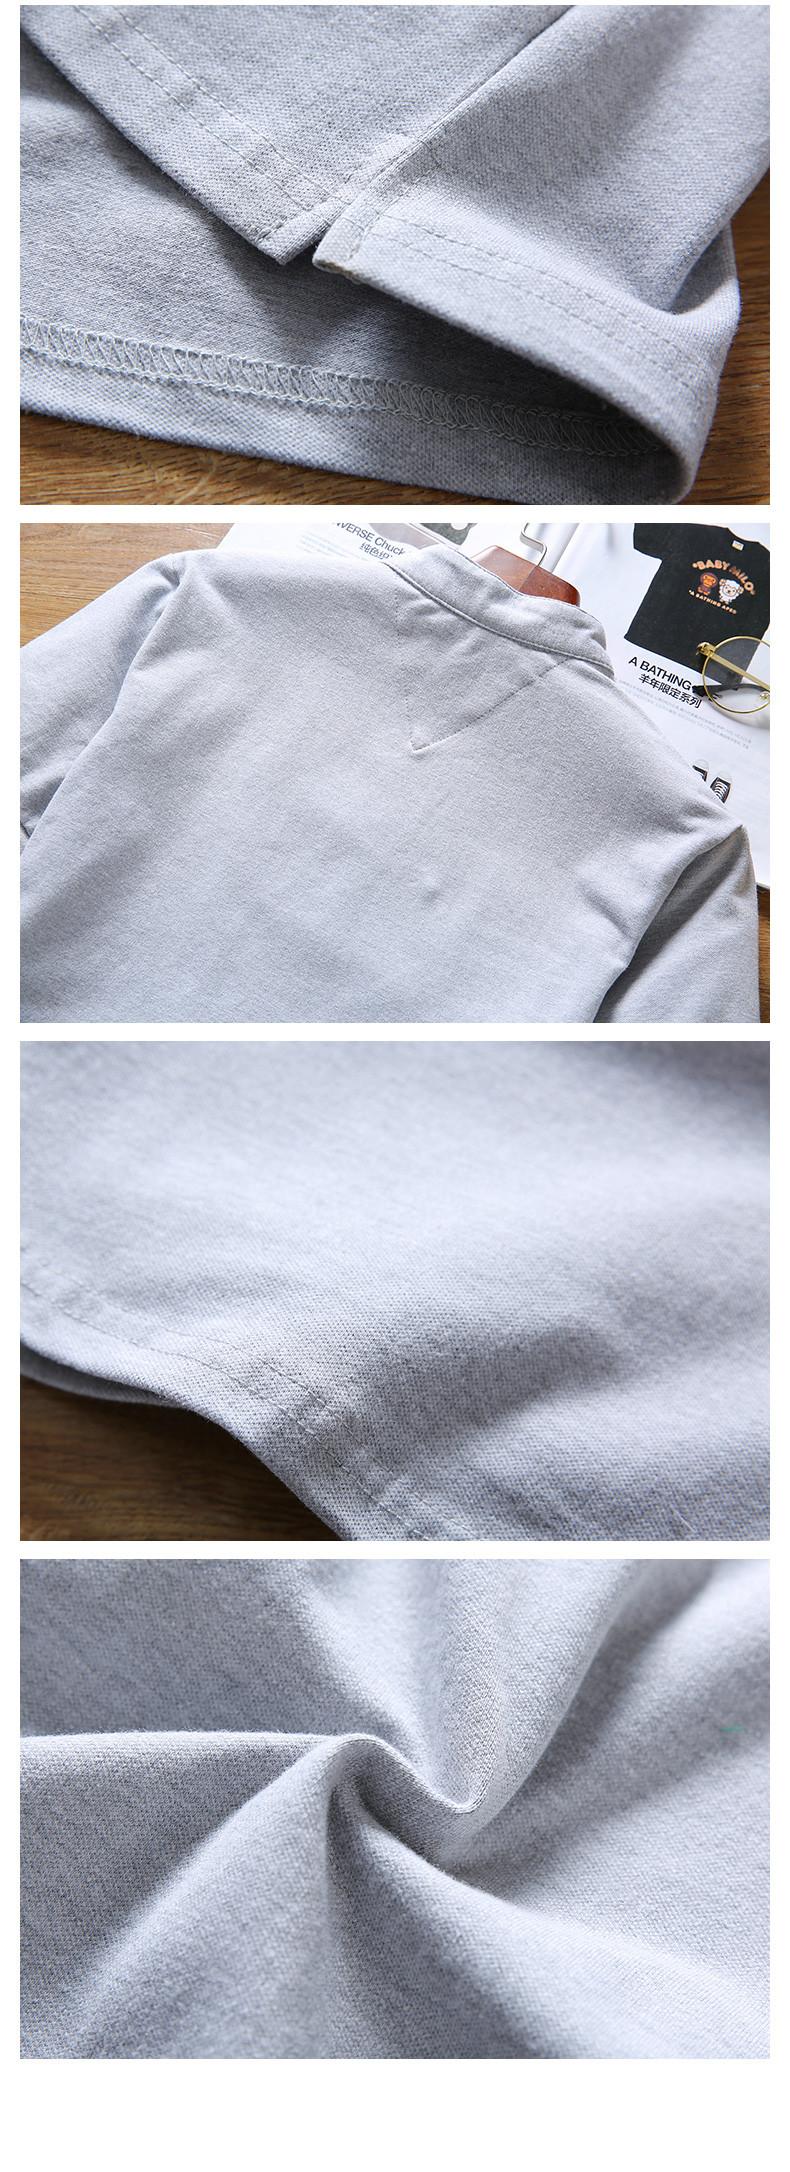 2019 New Arrival Cotton Men Polo Shirt Tops Fashion Brand Plus Size Short Sleeve Black White Polo Shirt Homme Camisa 5XL 23